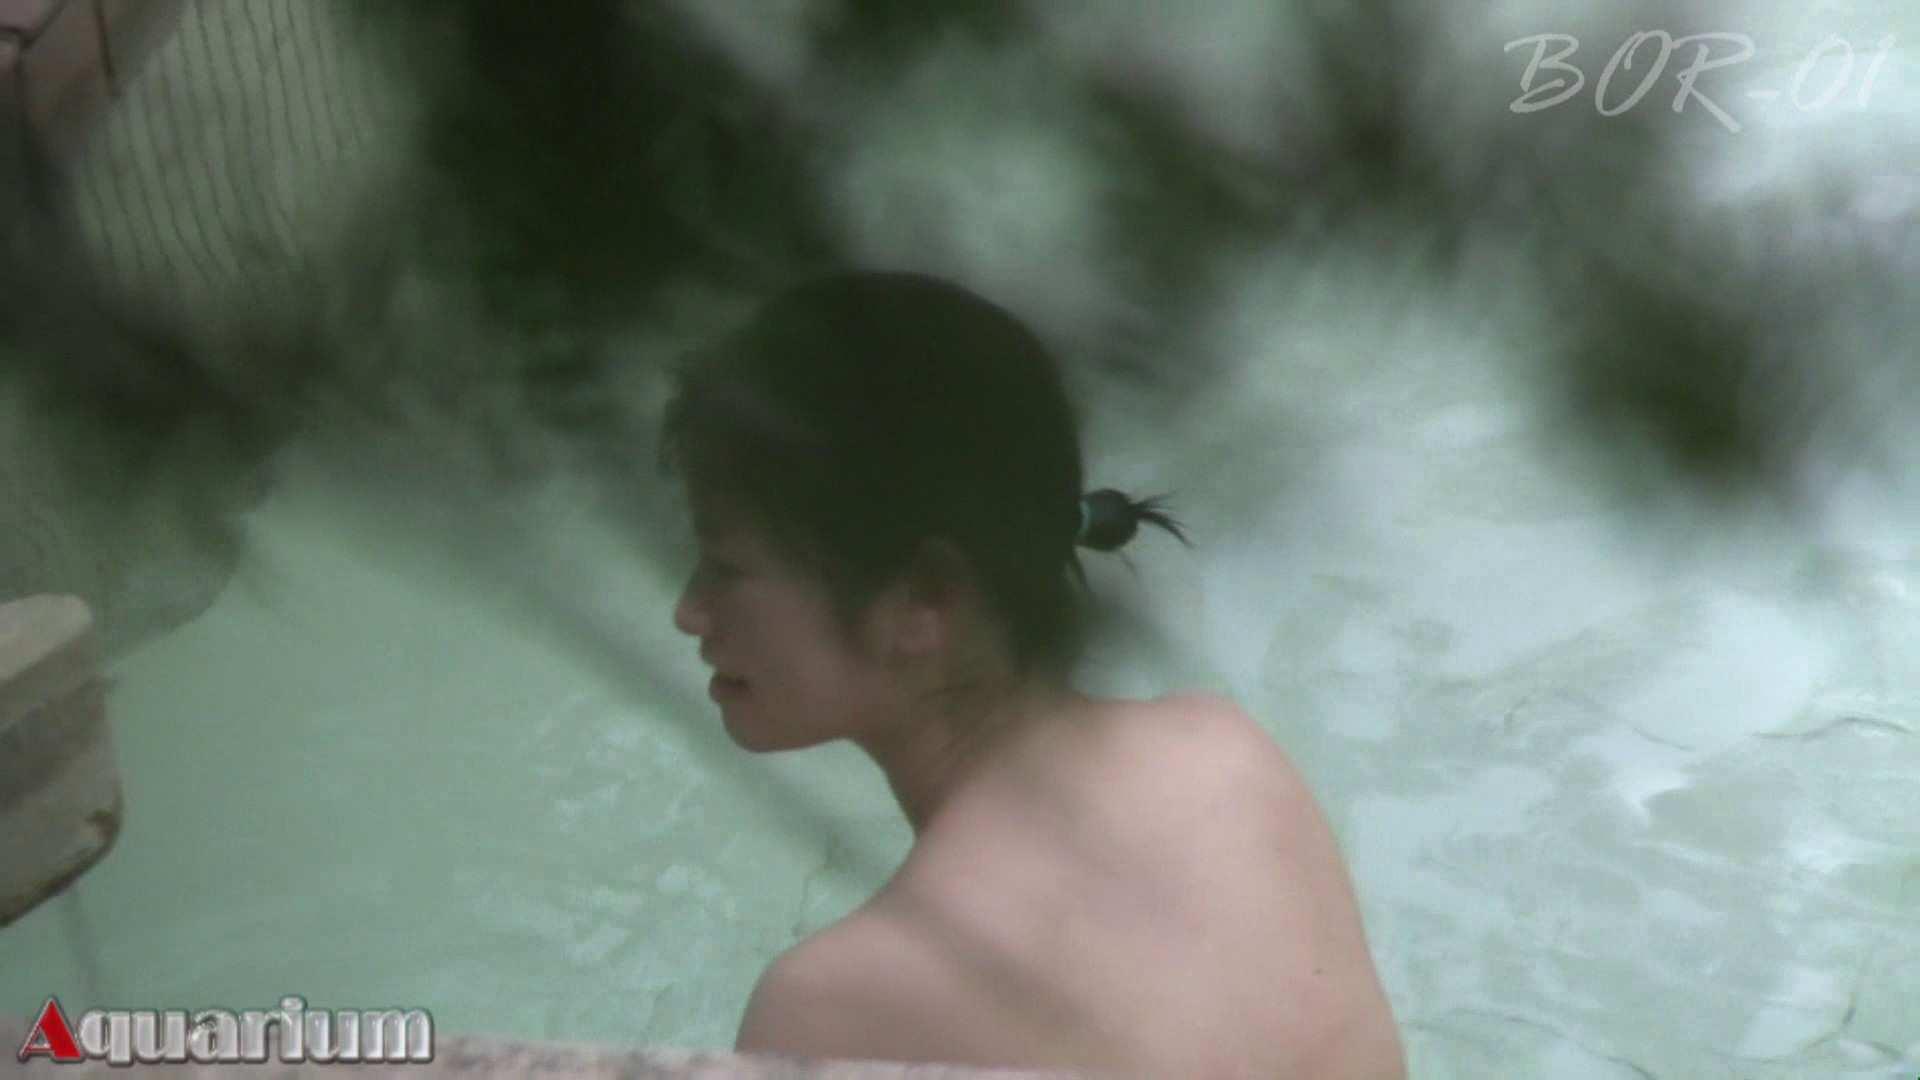 Aquaな露天風呂Vol.465 美しいOLの裸体 おめこ無修正動画無料 103pic 80